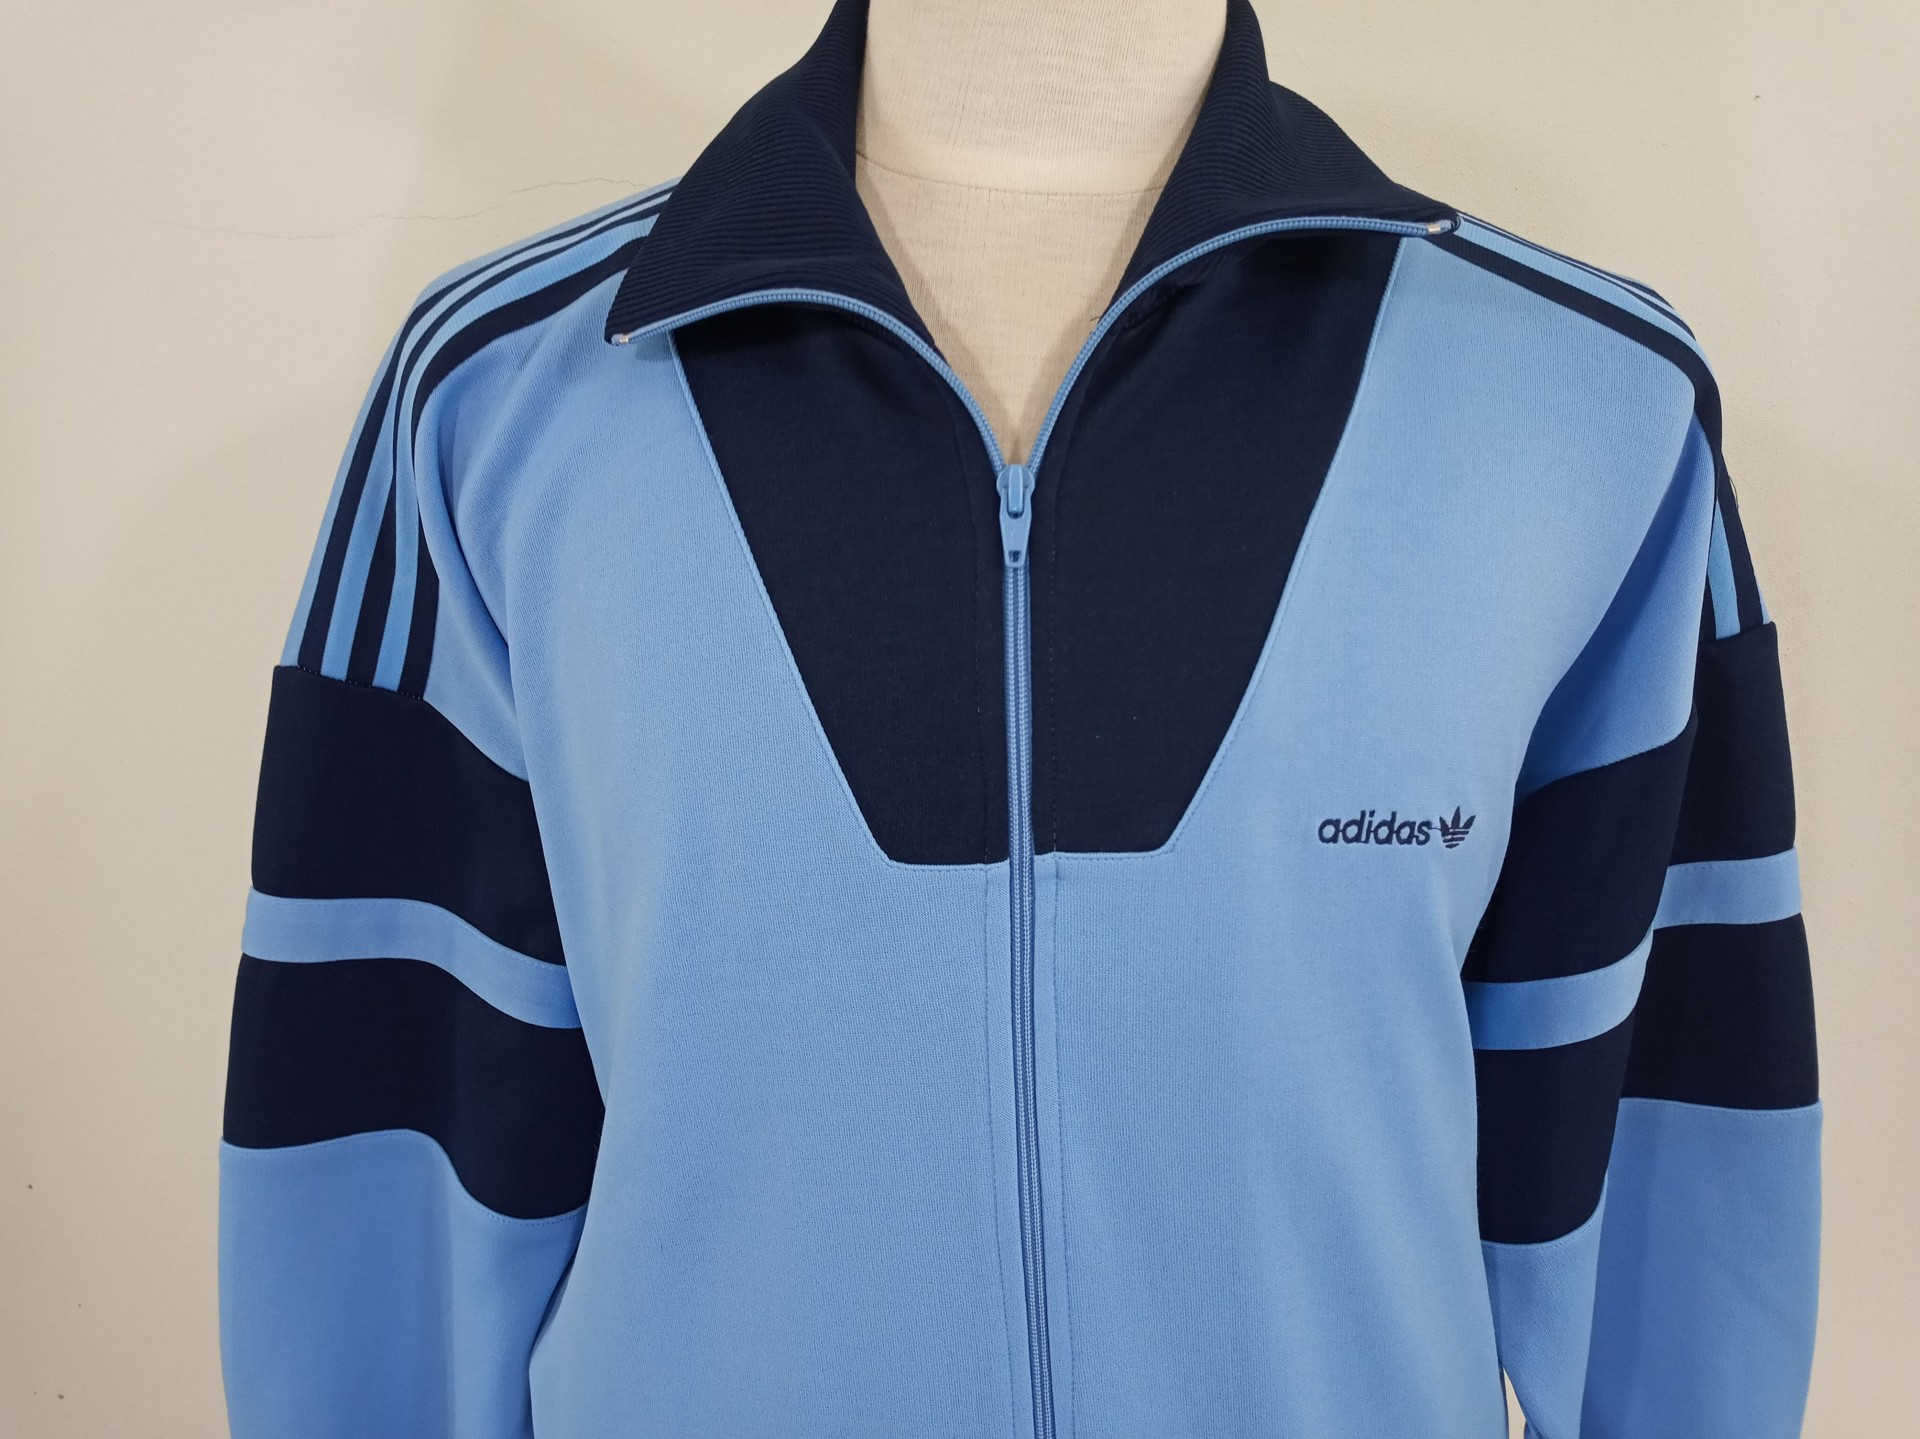 Vintage Track Top Adidas 1990s (M) Blue Jacket